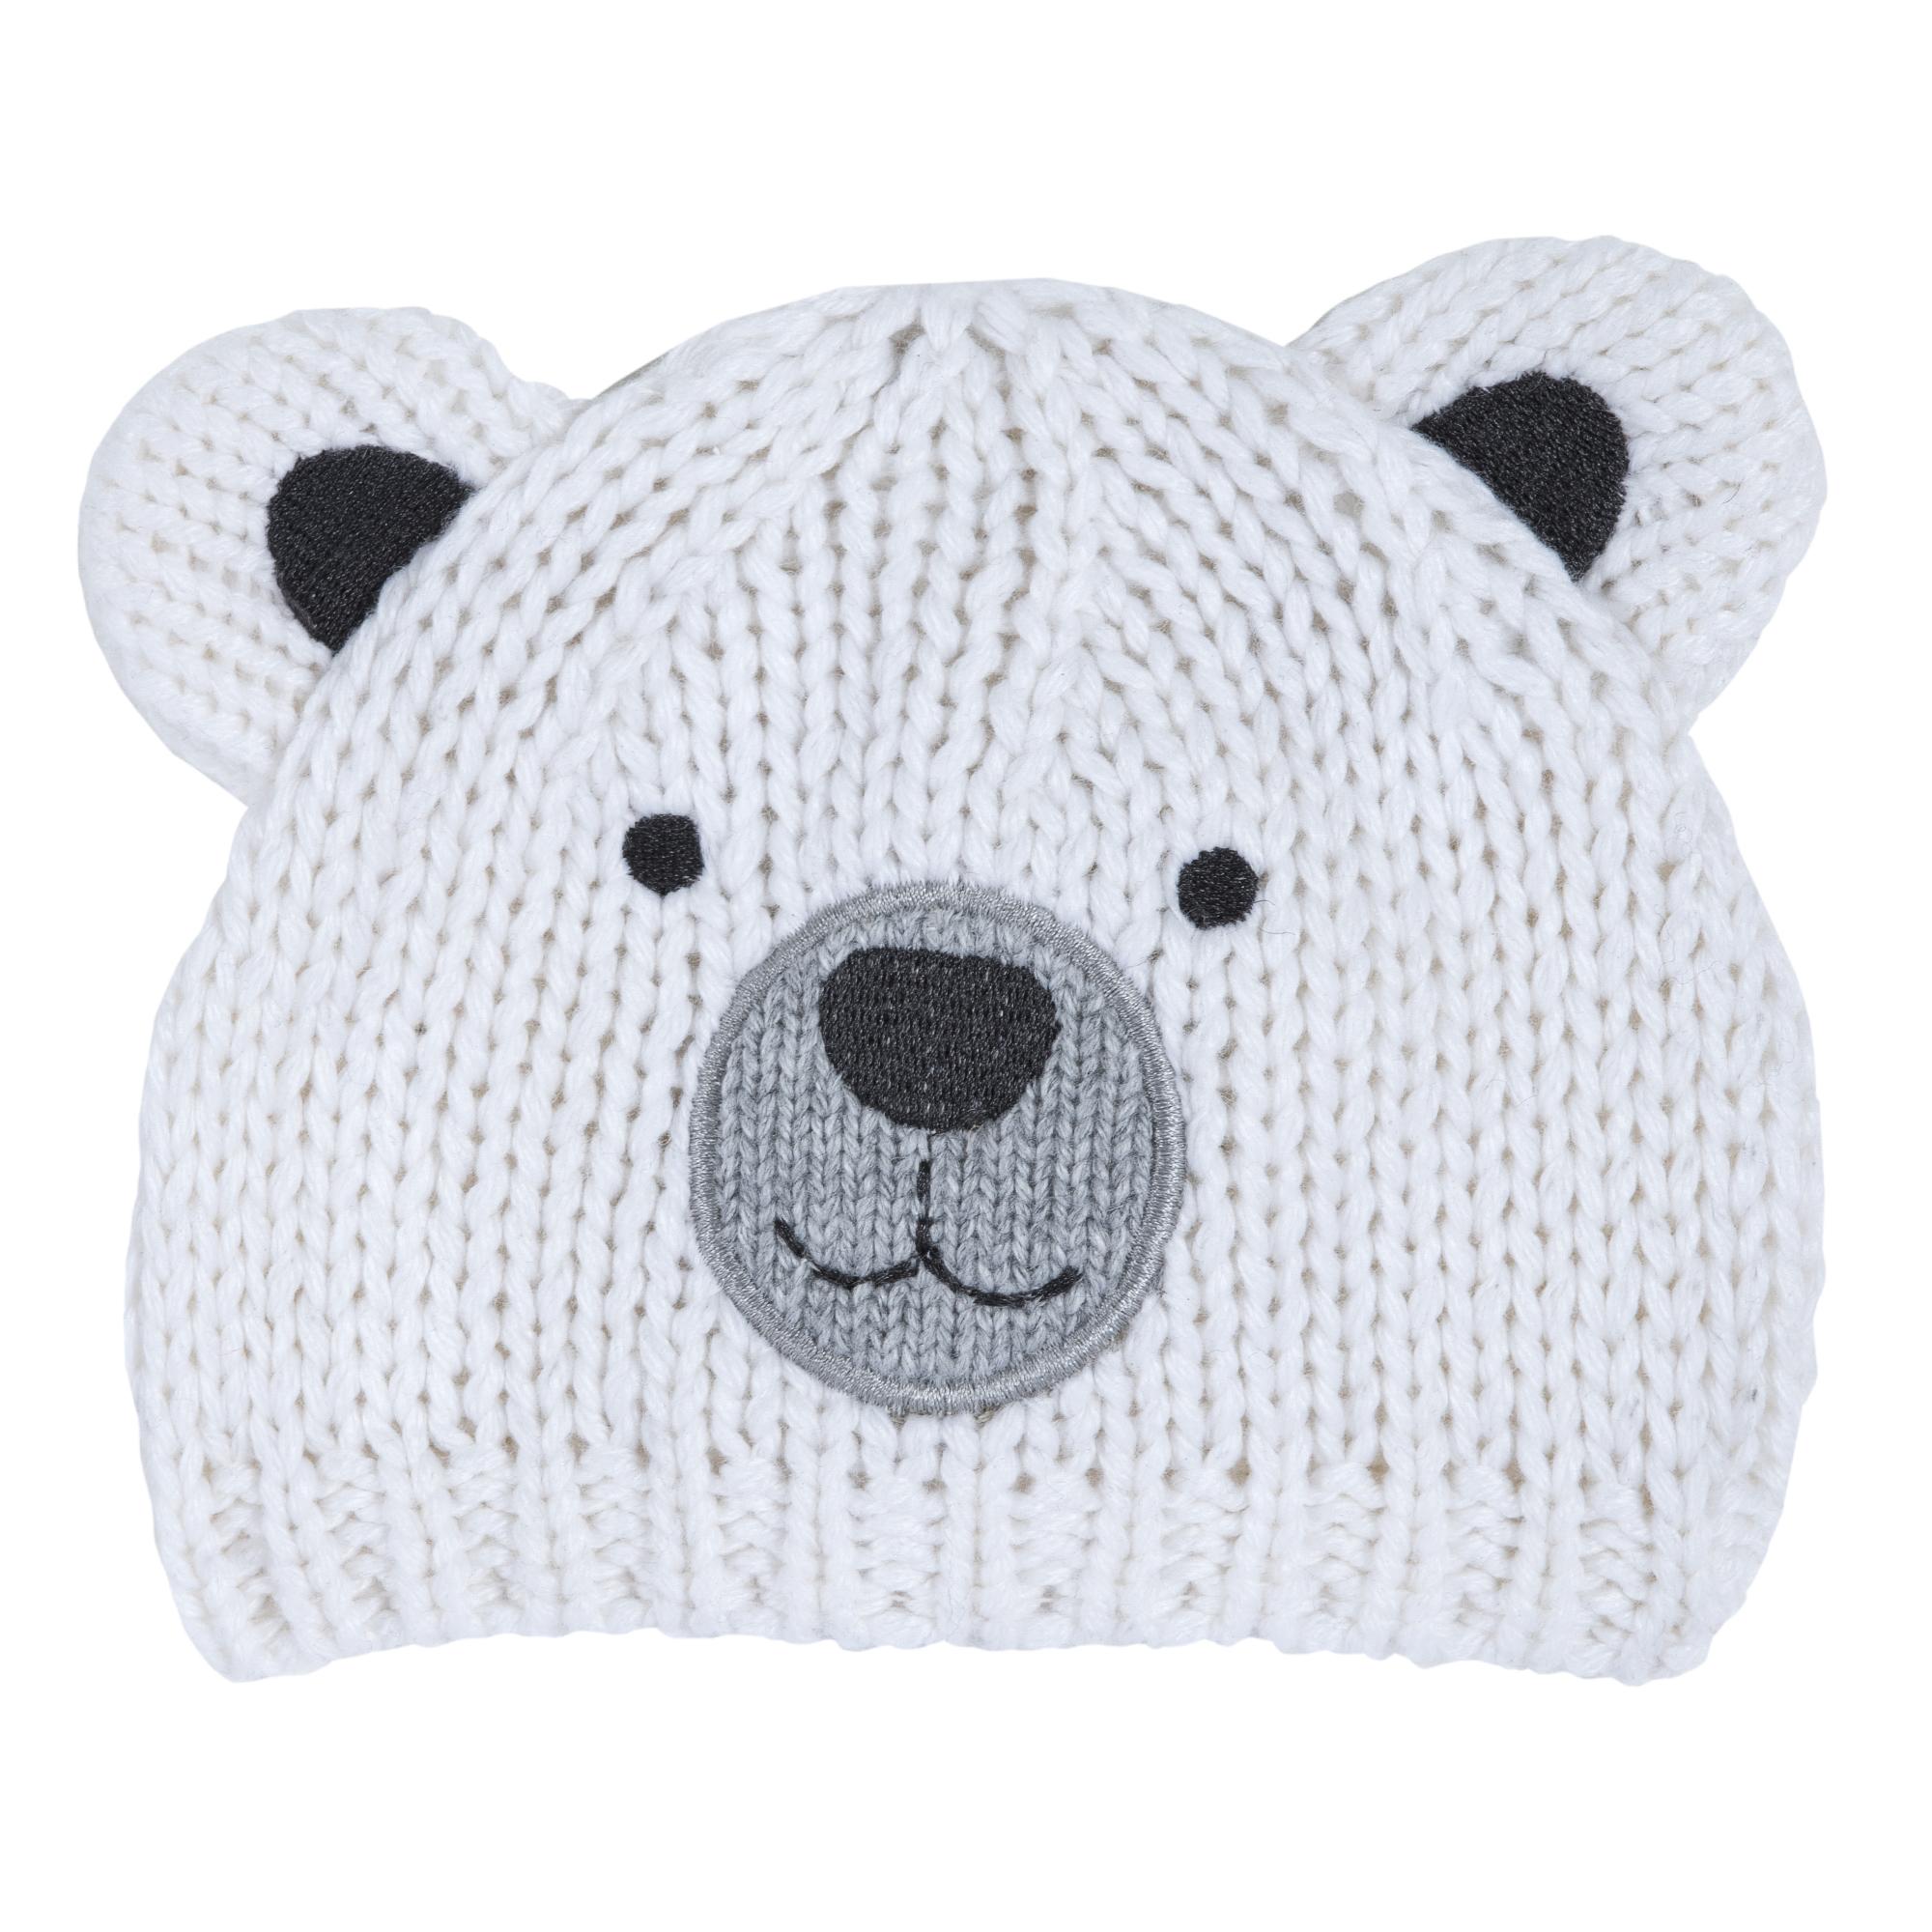 Caciula copii Chicco, tricotata, alb, forma ursulet, 04545